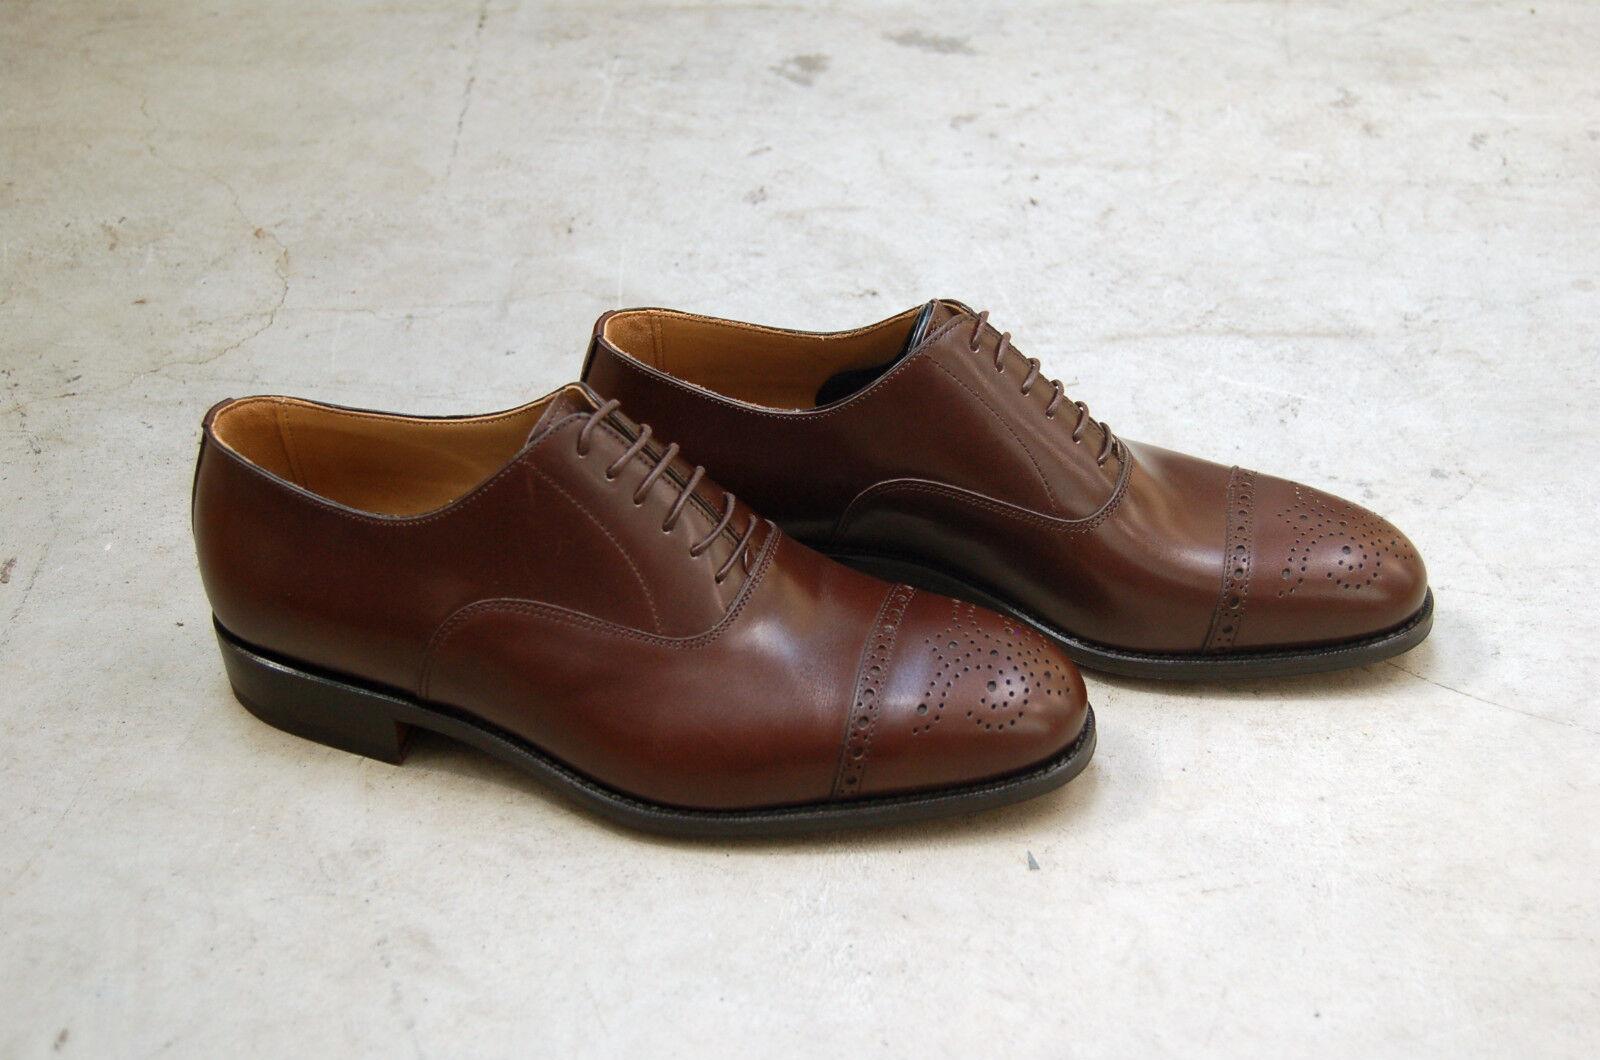 MAN - 40 - 6eu - OXFORD CAPTOE CAPTOE OXFORD PERFS&MED- CHOCOLATE BROWN - LTH SOLE cb3779